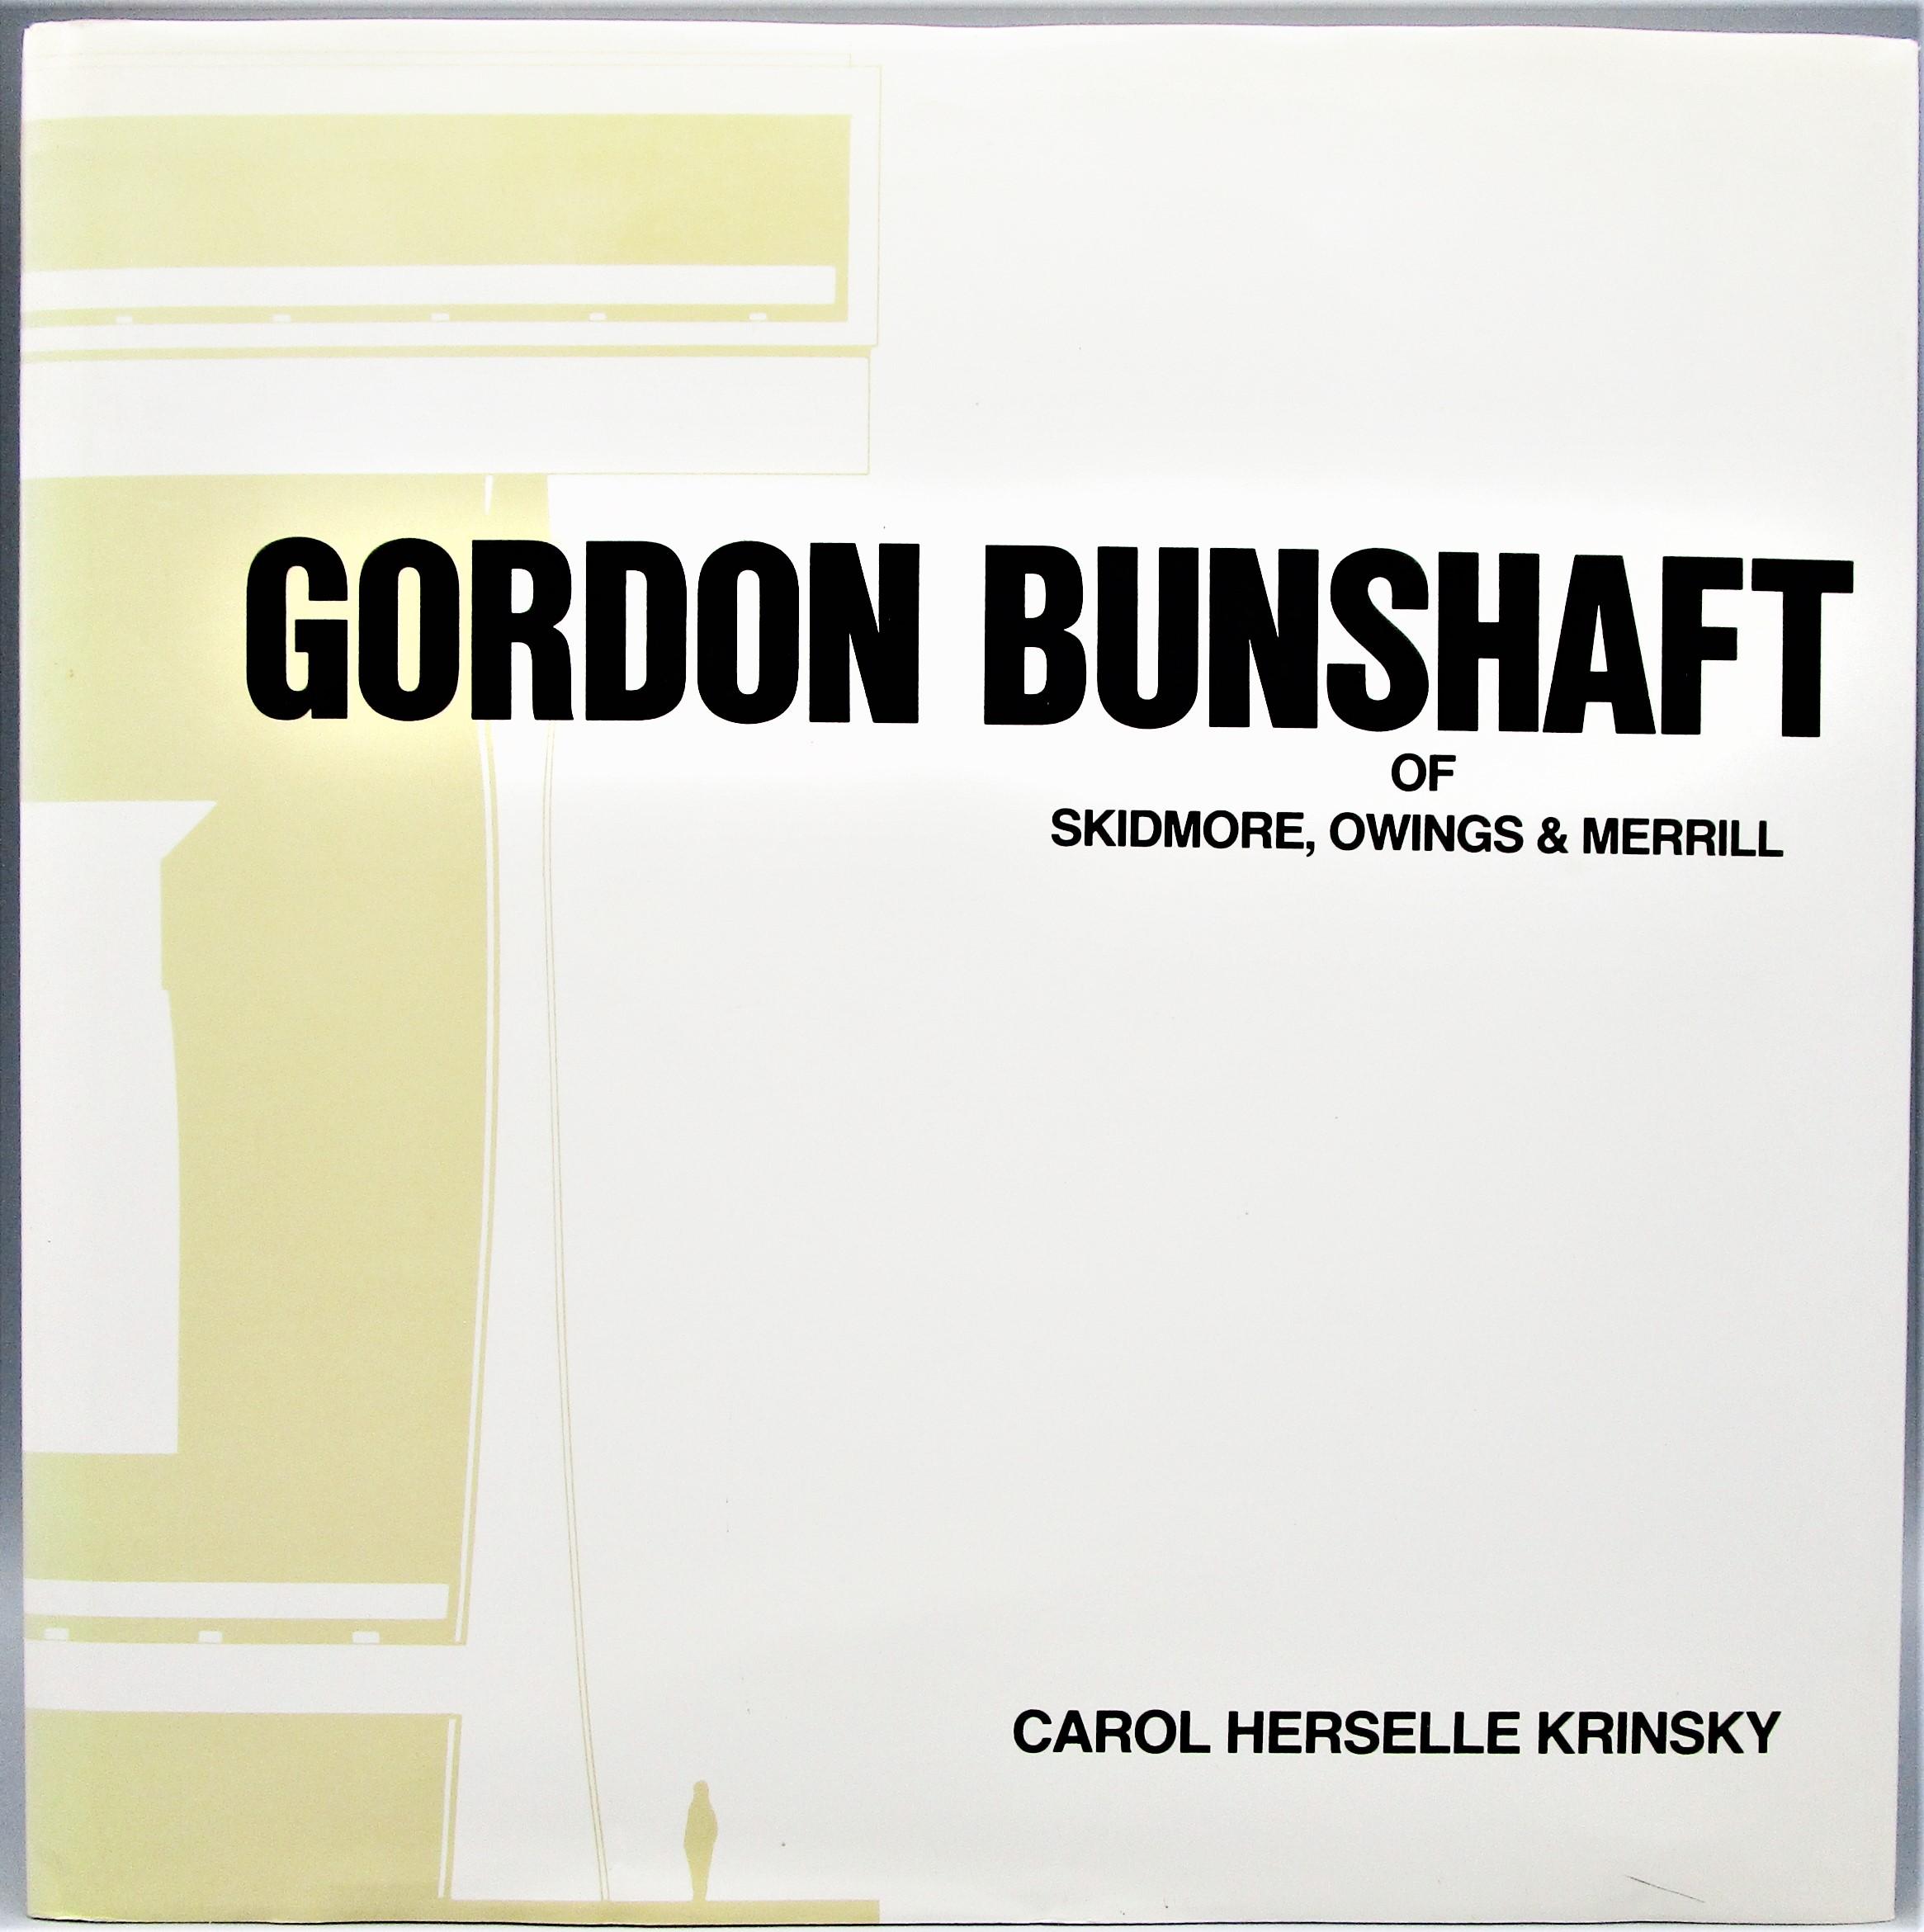 GORDON BUNSHAFT, by Carol Herselle Krinsky - 1988